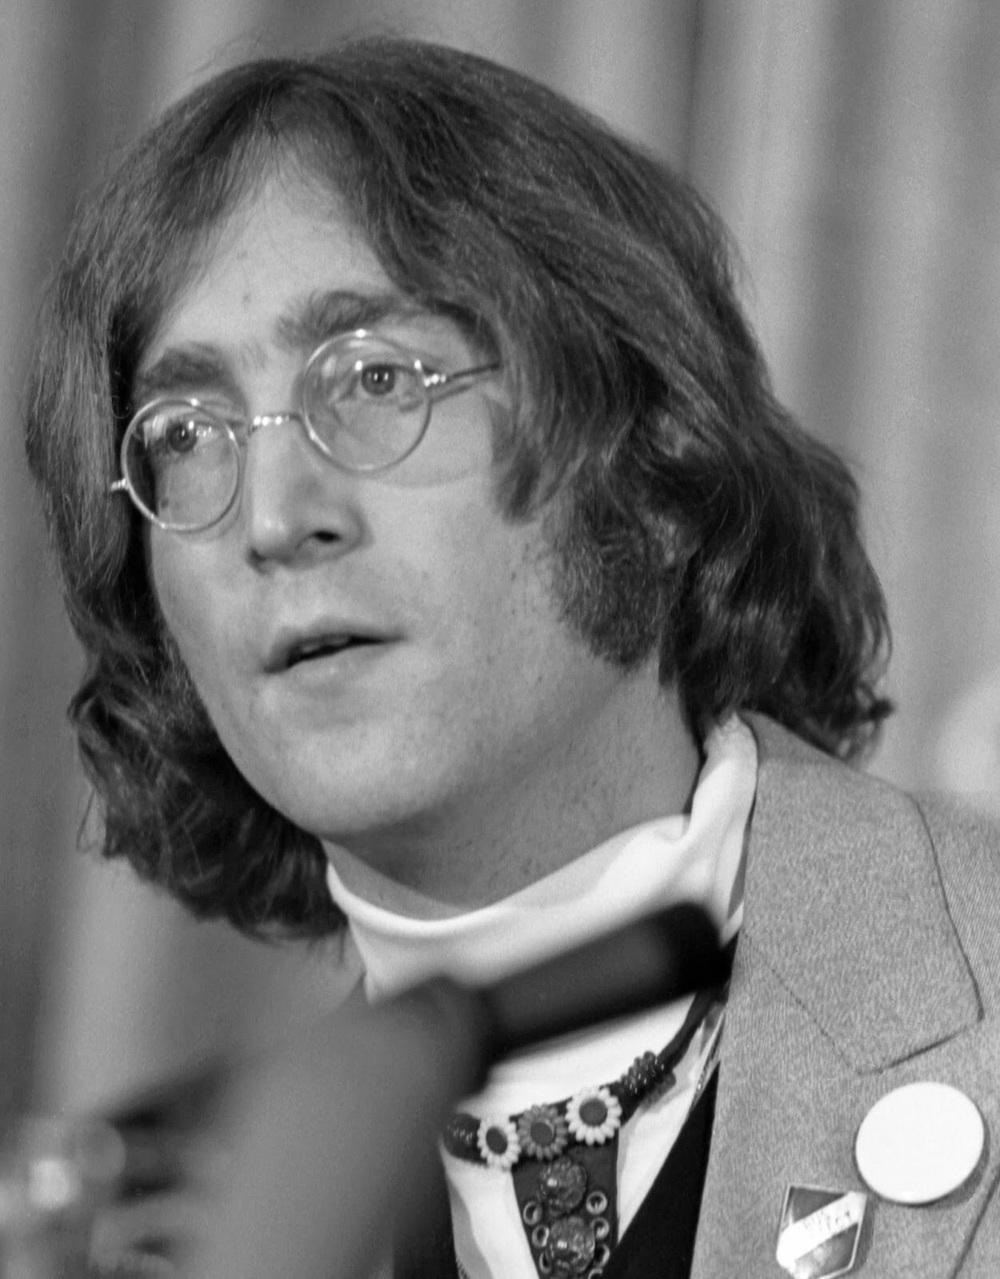 John Lennon at an Apple press conference, May 1968.